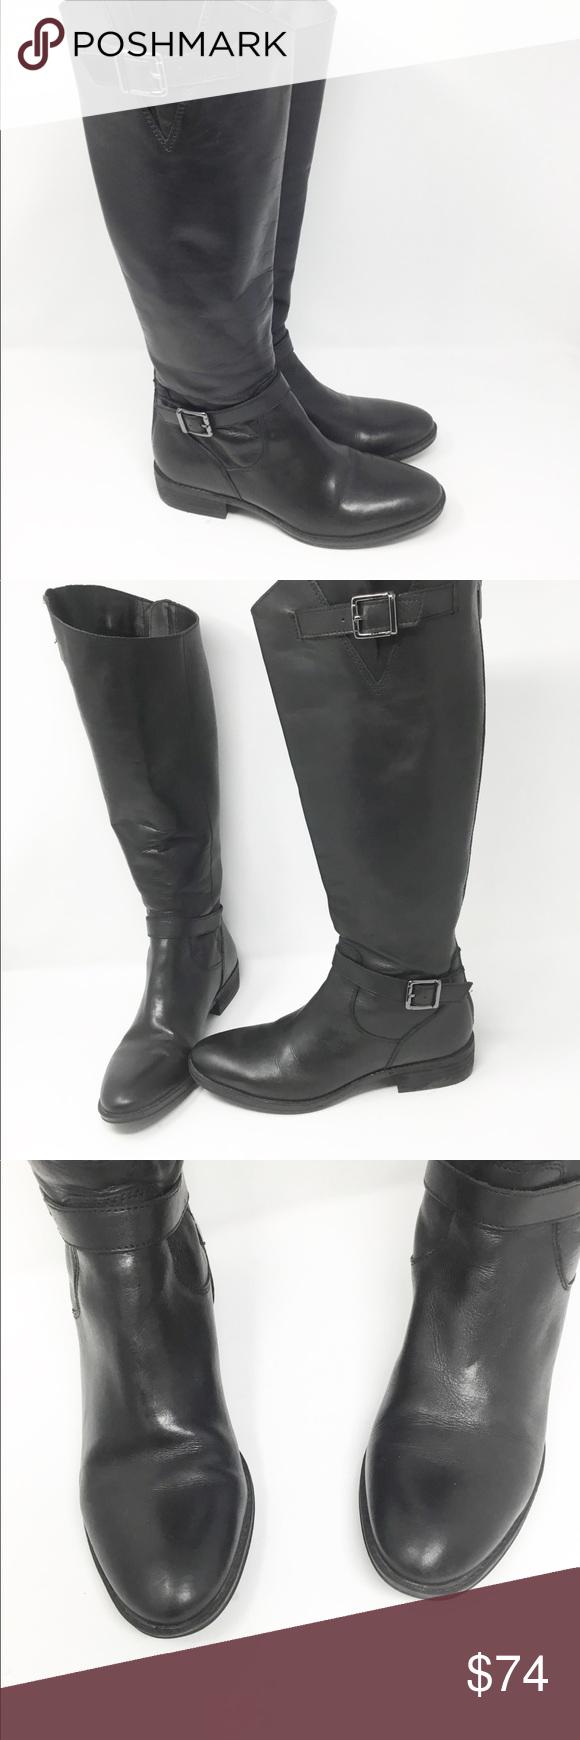 655b73a19da8e Sam Edelman Painter black leather riding boots Sam Edelman black leather  riding boots Size  7.5